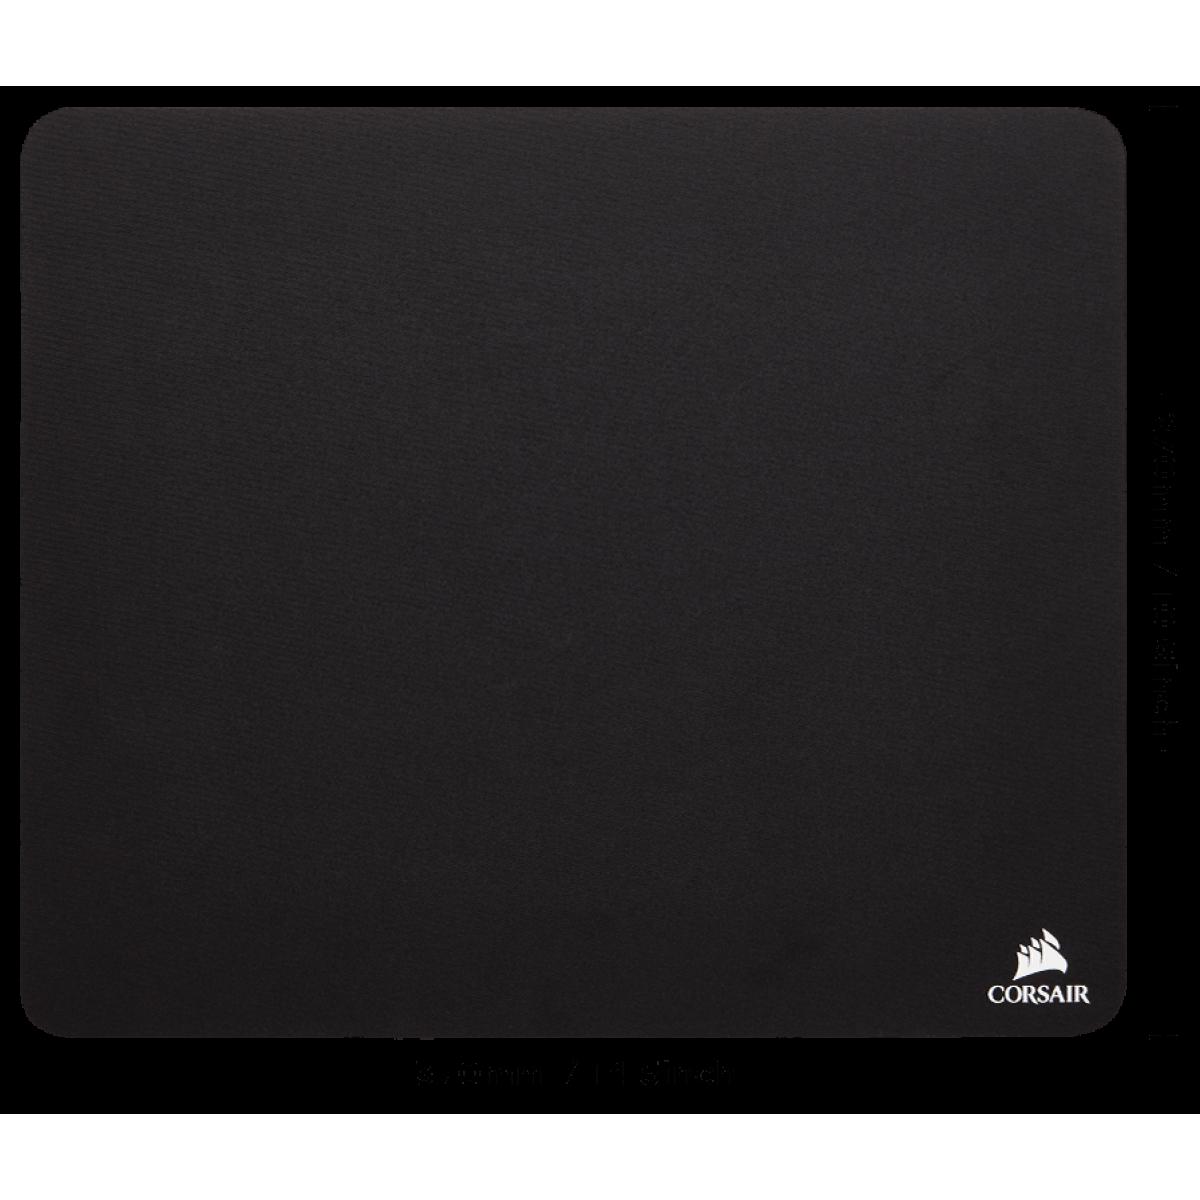 Mouse Pad Gamer Corsair MM100 Preto CH-9100020-WW